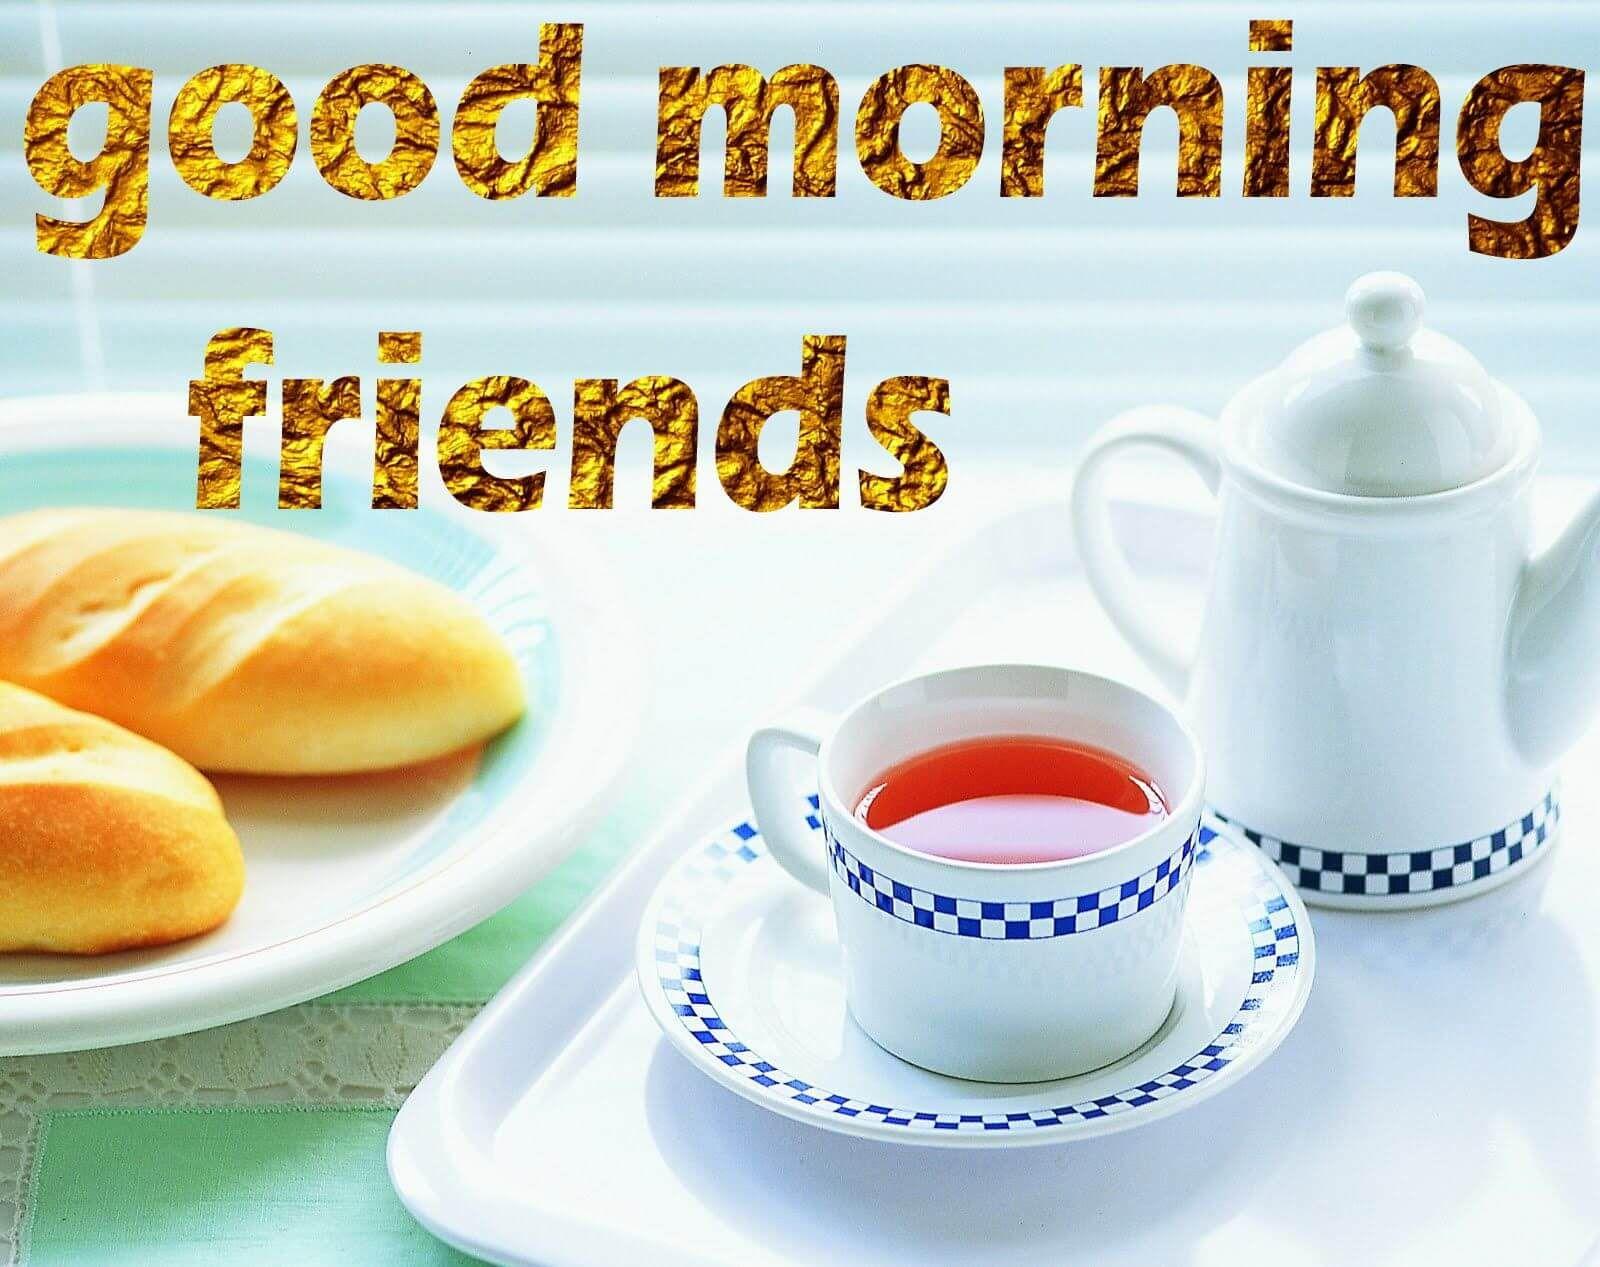 Good Morning Photos Good Morning Wallpaper Good Morning Friends Good Morning Wishes